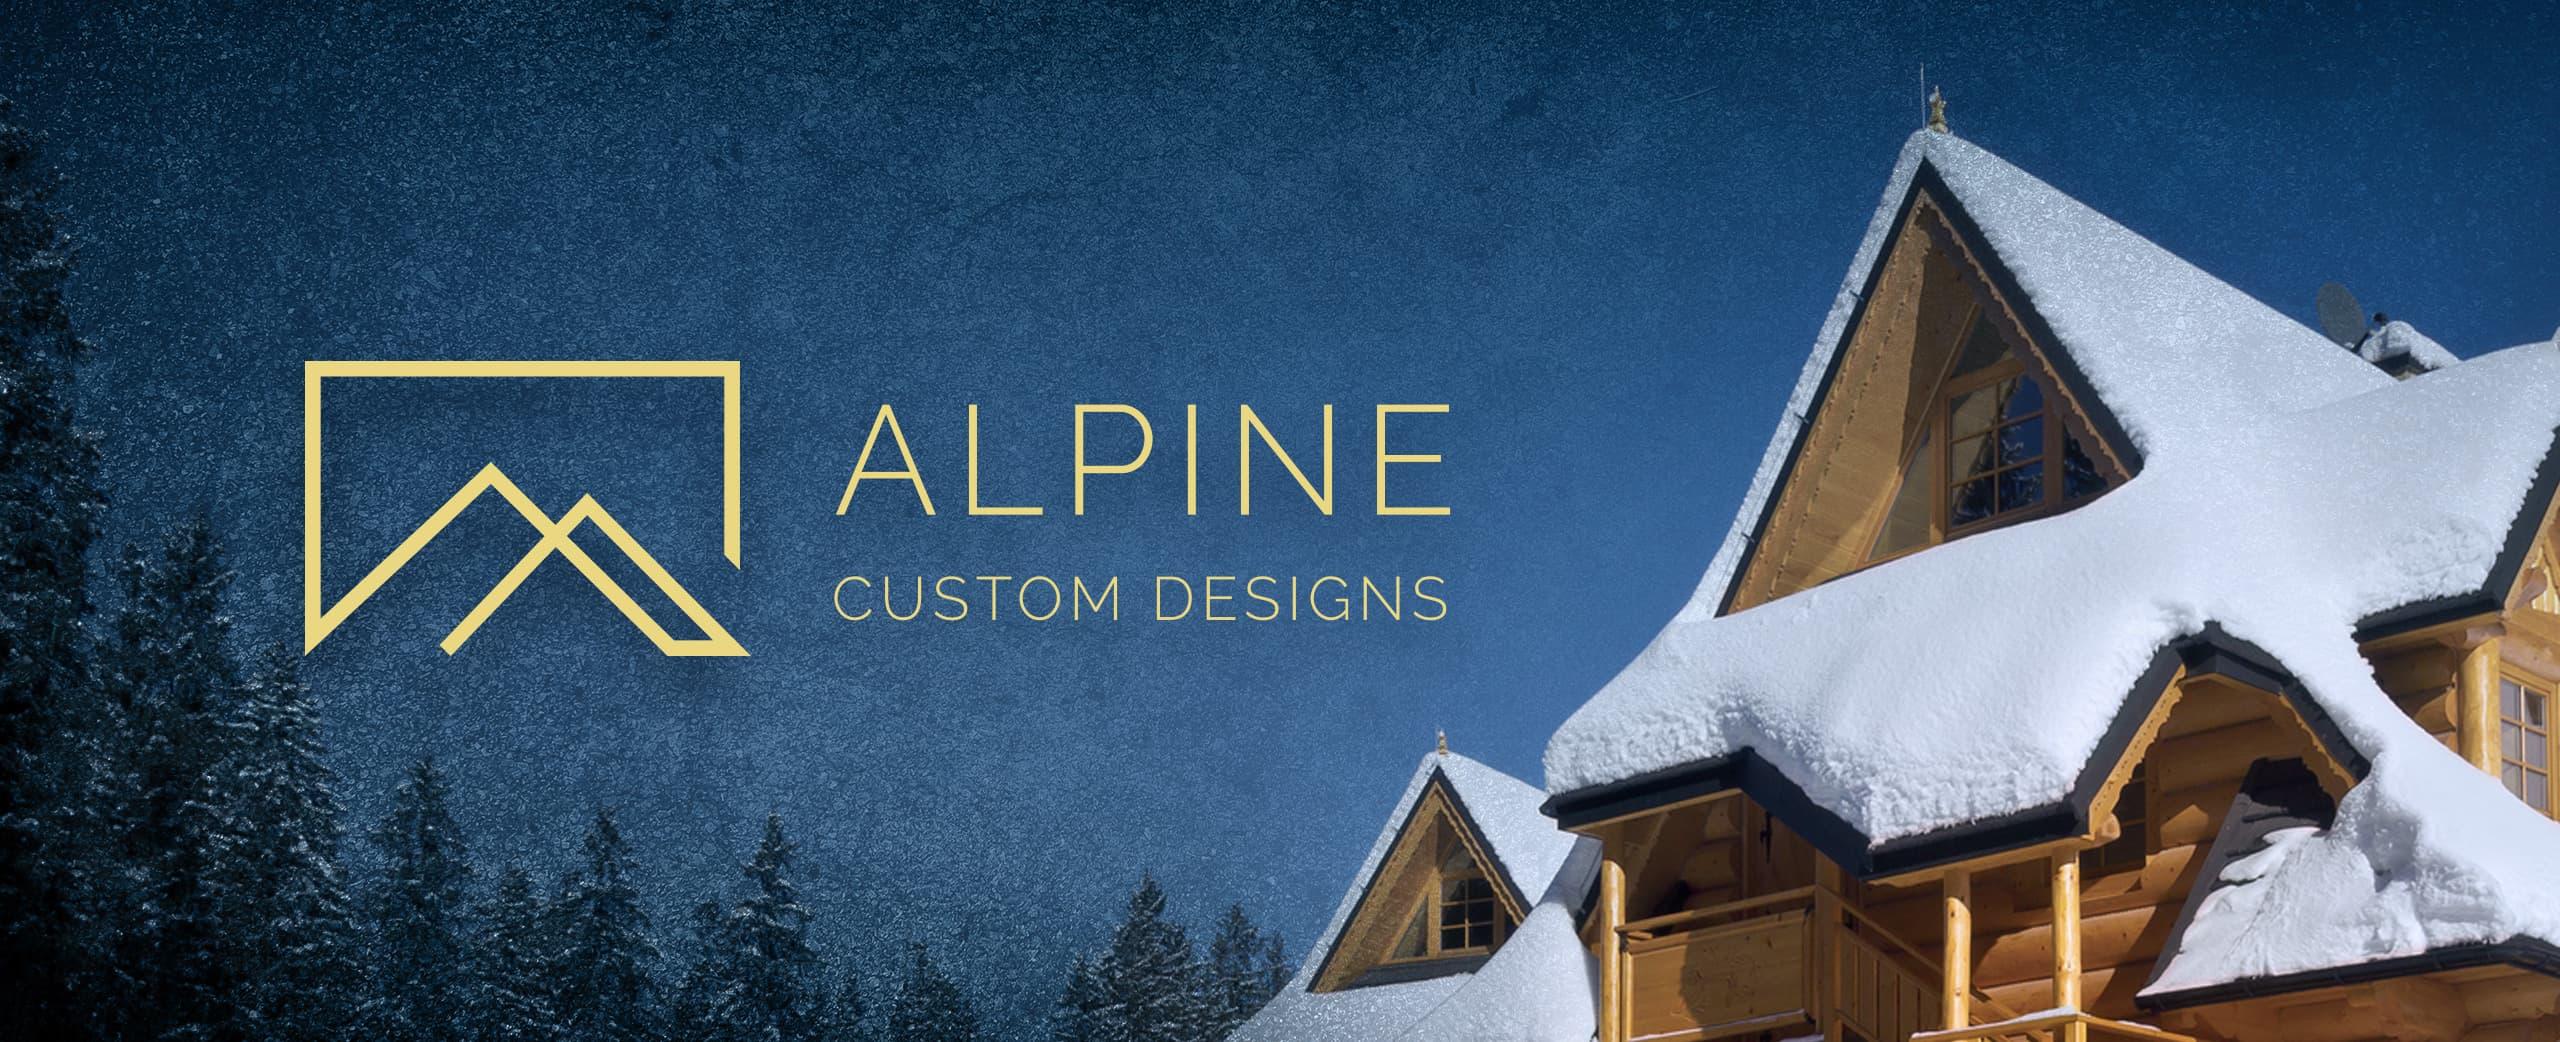 dmg-logos-alpine-custom-designs